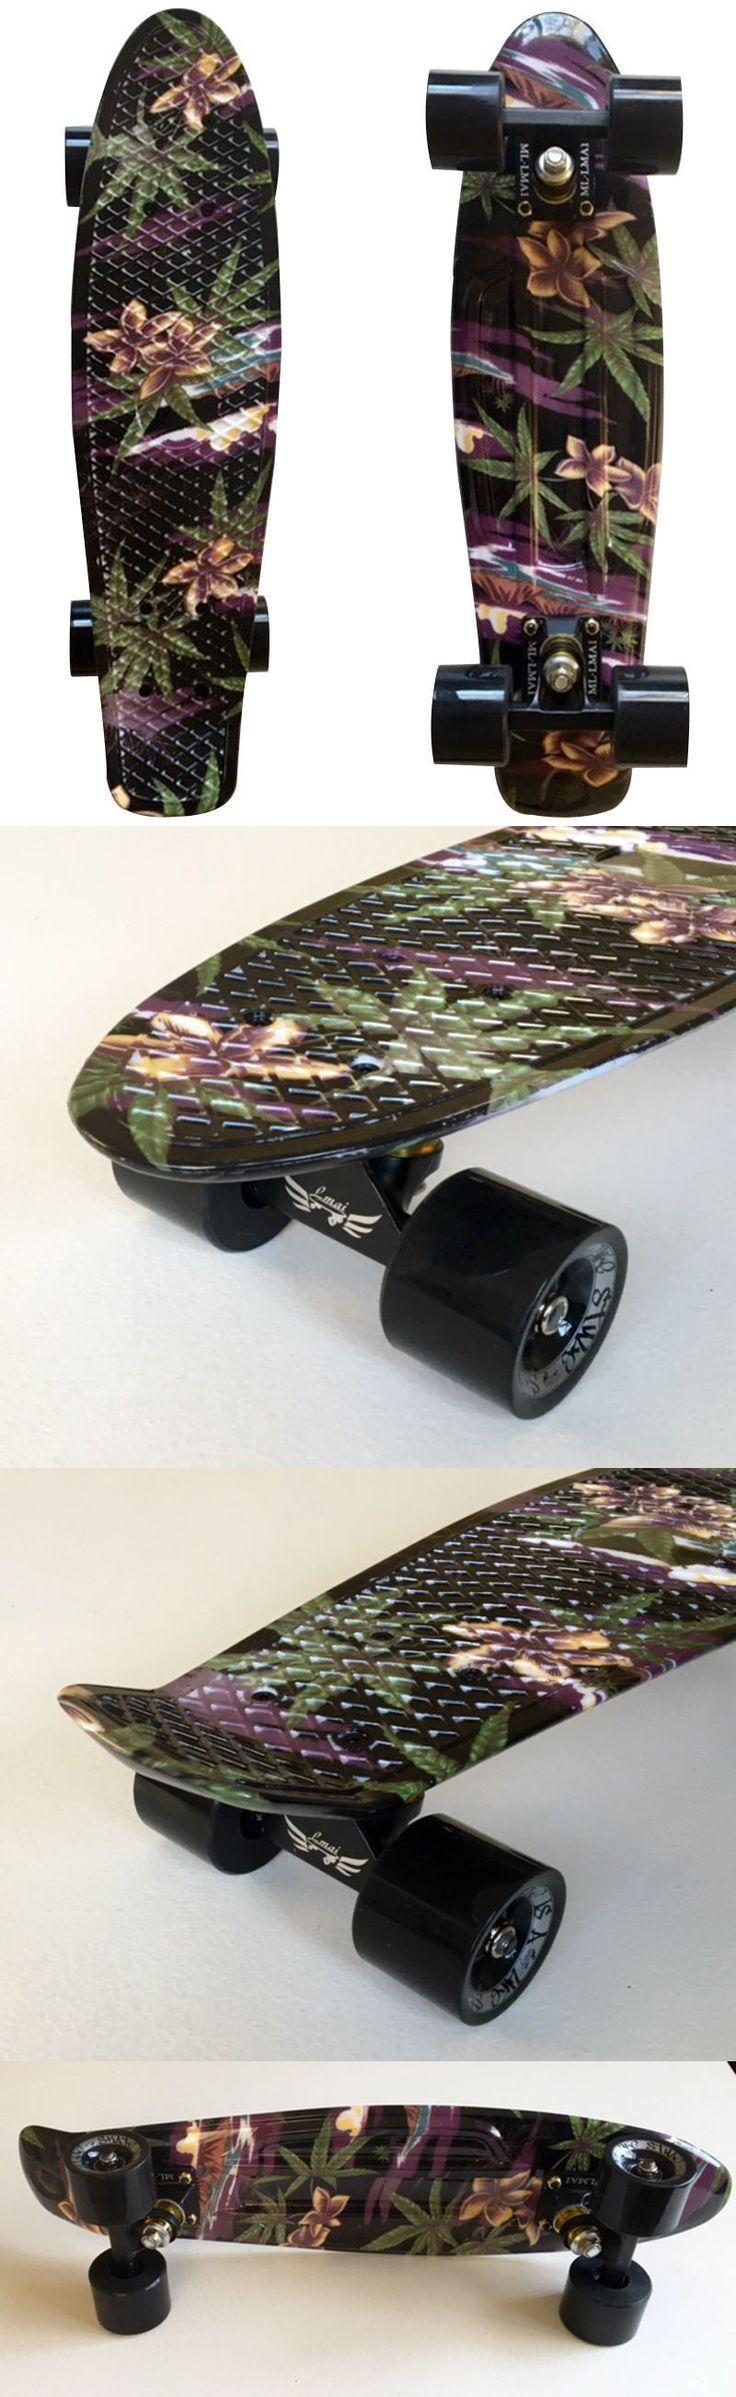 Skateboards-Complete 16264: Lmai 22 Cruiser Skateboard Graphic Flbb Board Penny Style Plastic Skateboard -> BUY IT NOW ONLY: $64.99 on eBay!